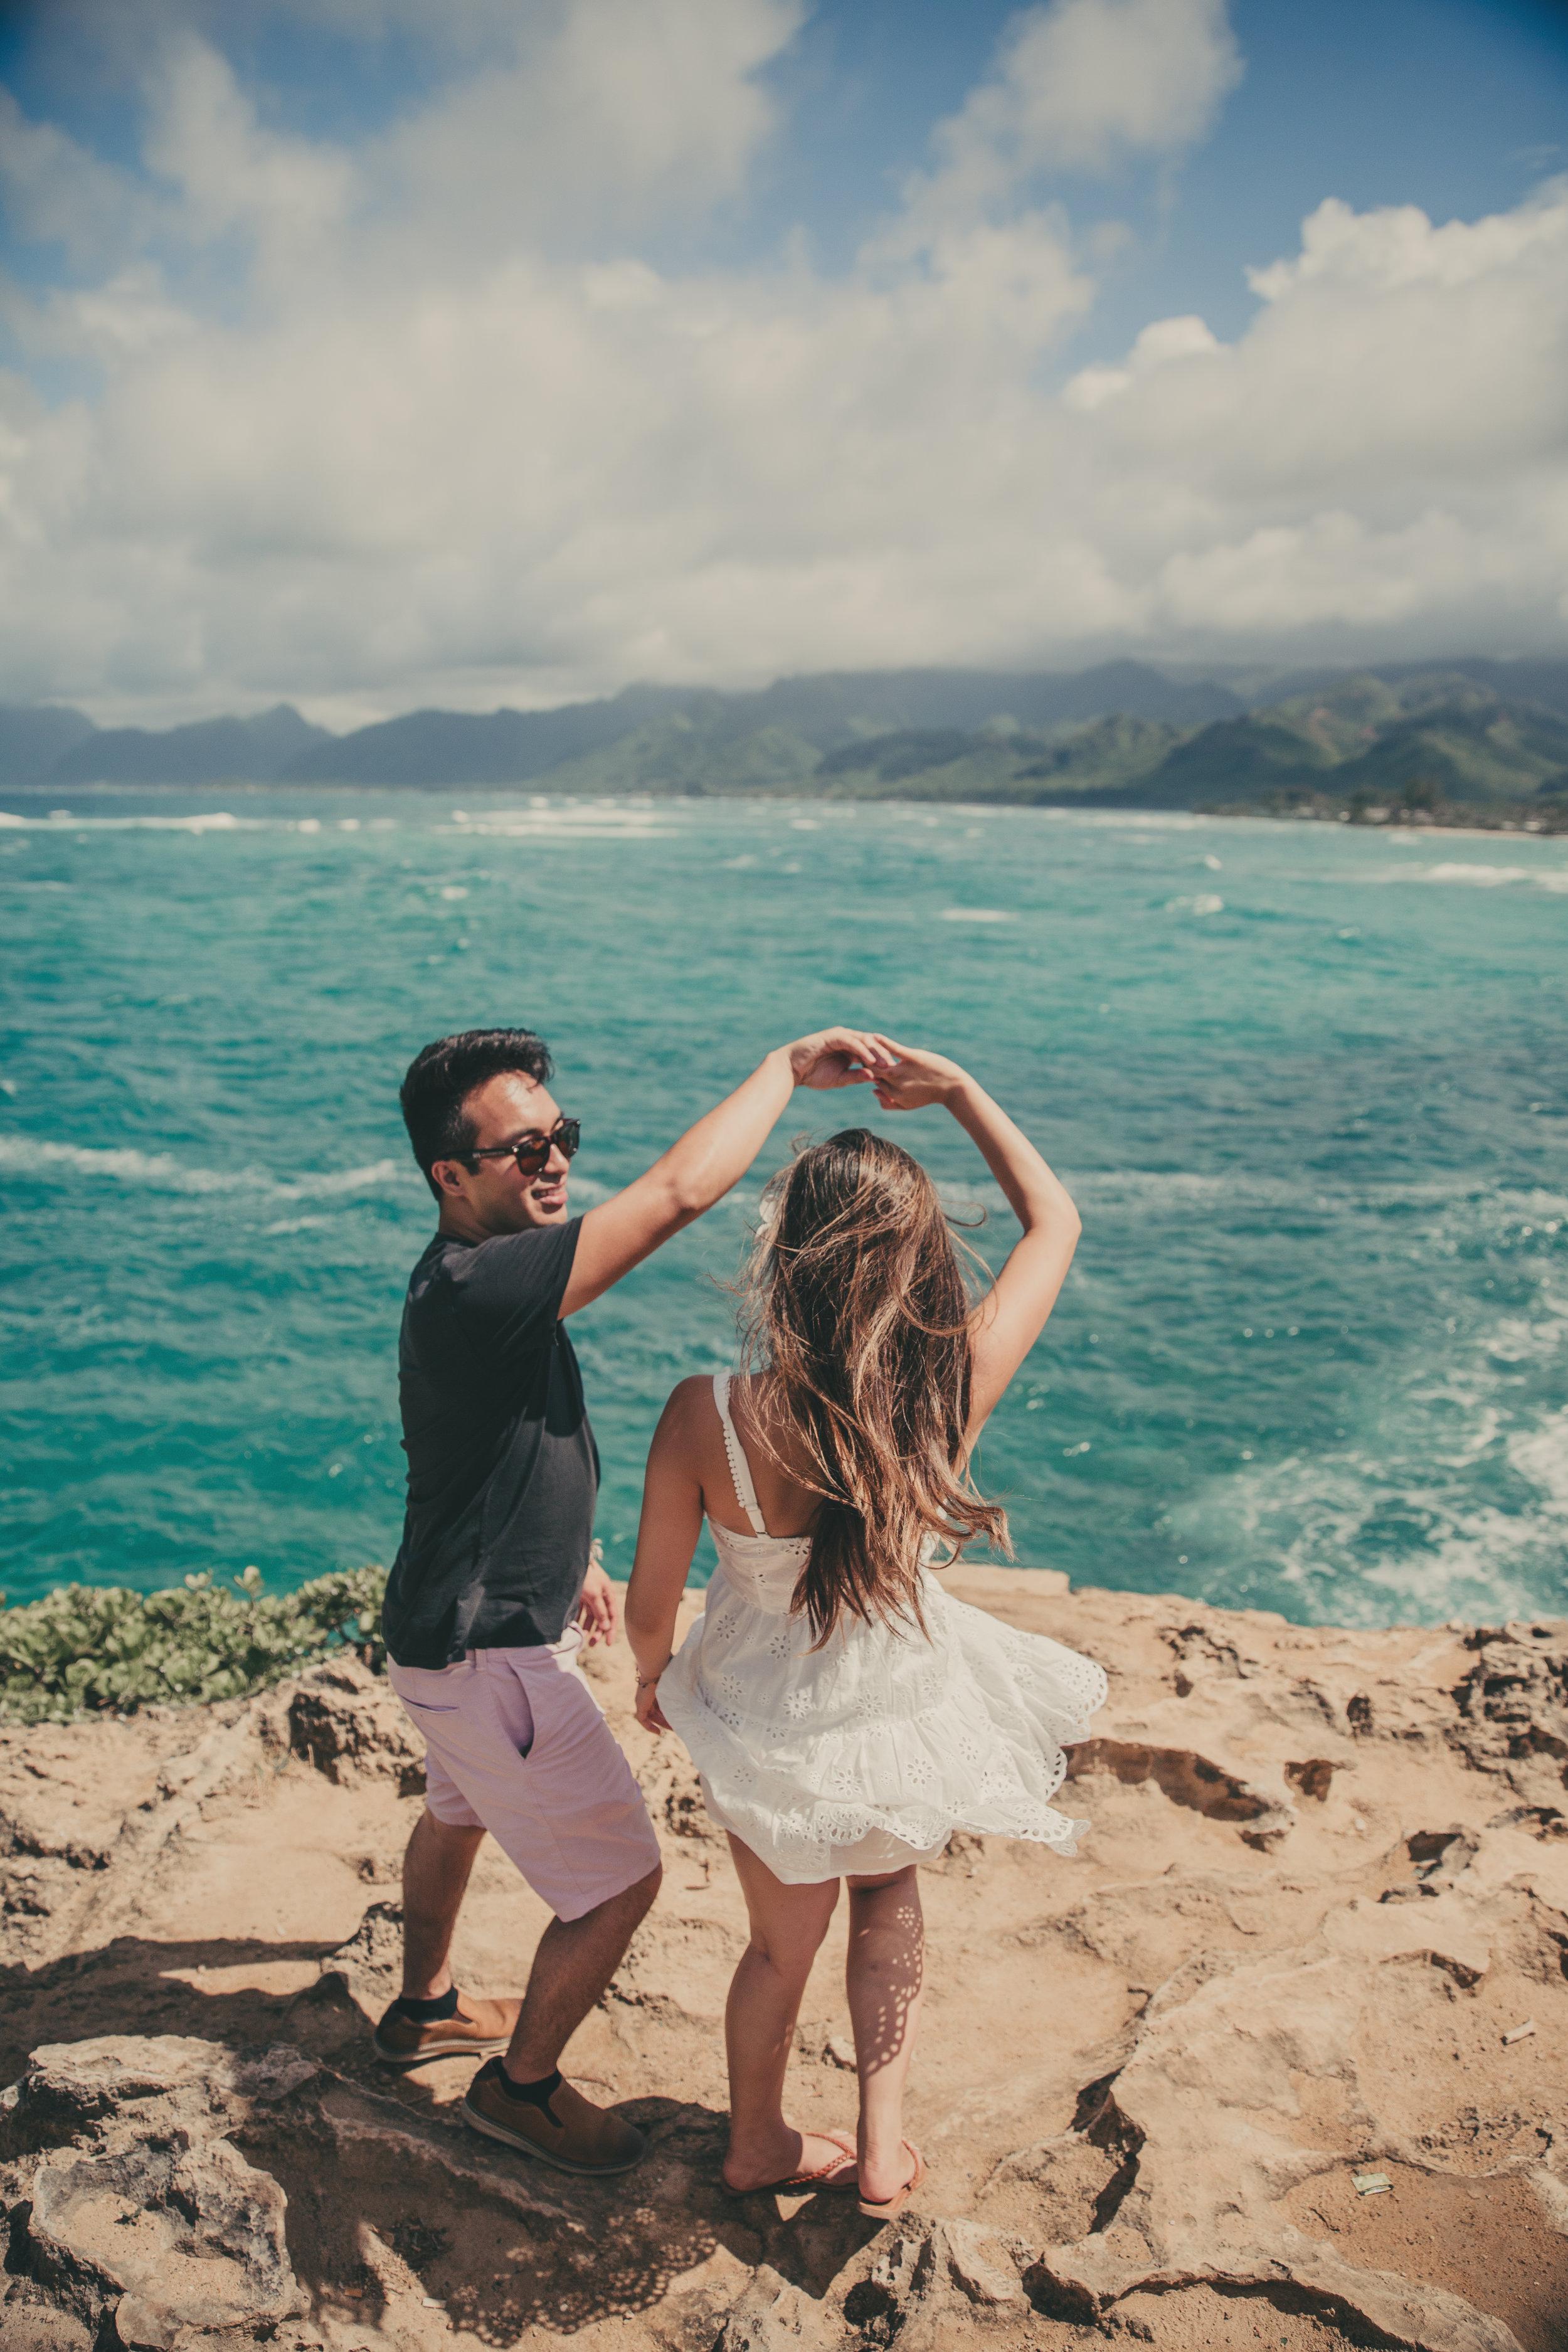 Hawai'i photographer, Oahu photographer, honolulu photographer, genkiphotos, genkimedia, engagement photos, Hawaii Couples Photography, Couples, Hawaii Proposal, Hawaii Sunset, North Shore Hawaii